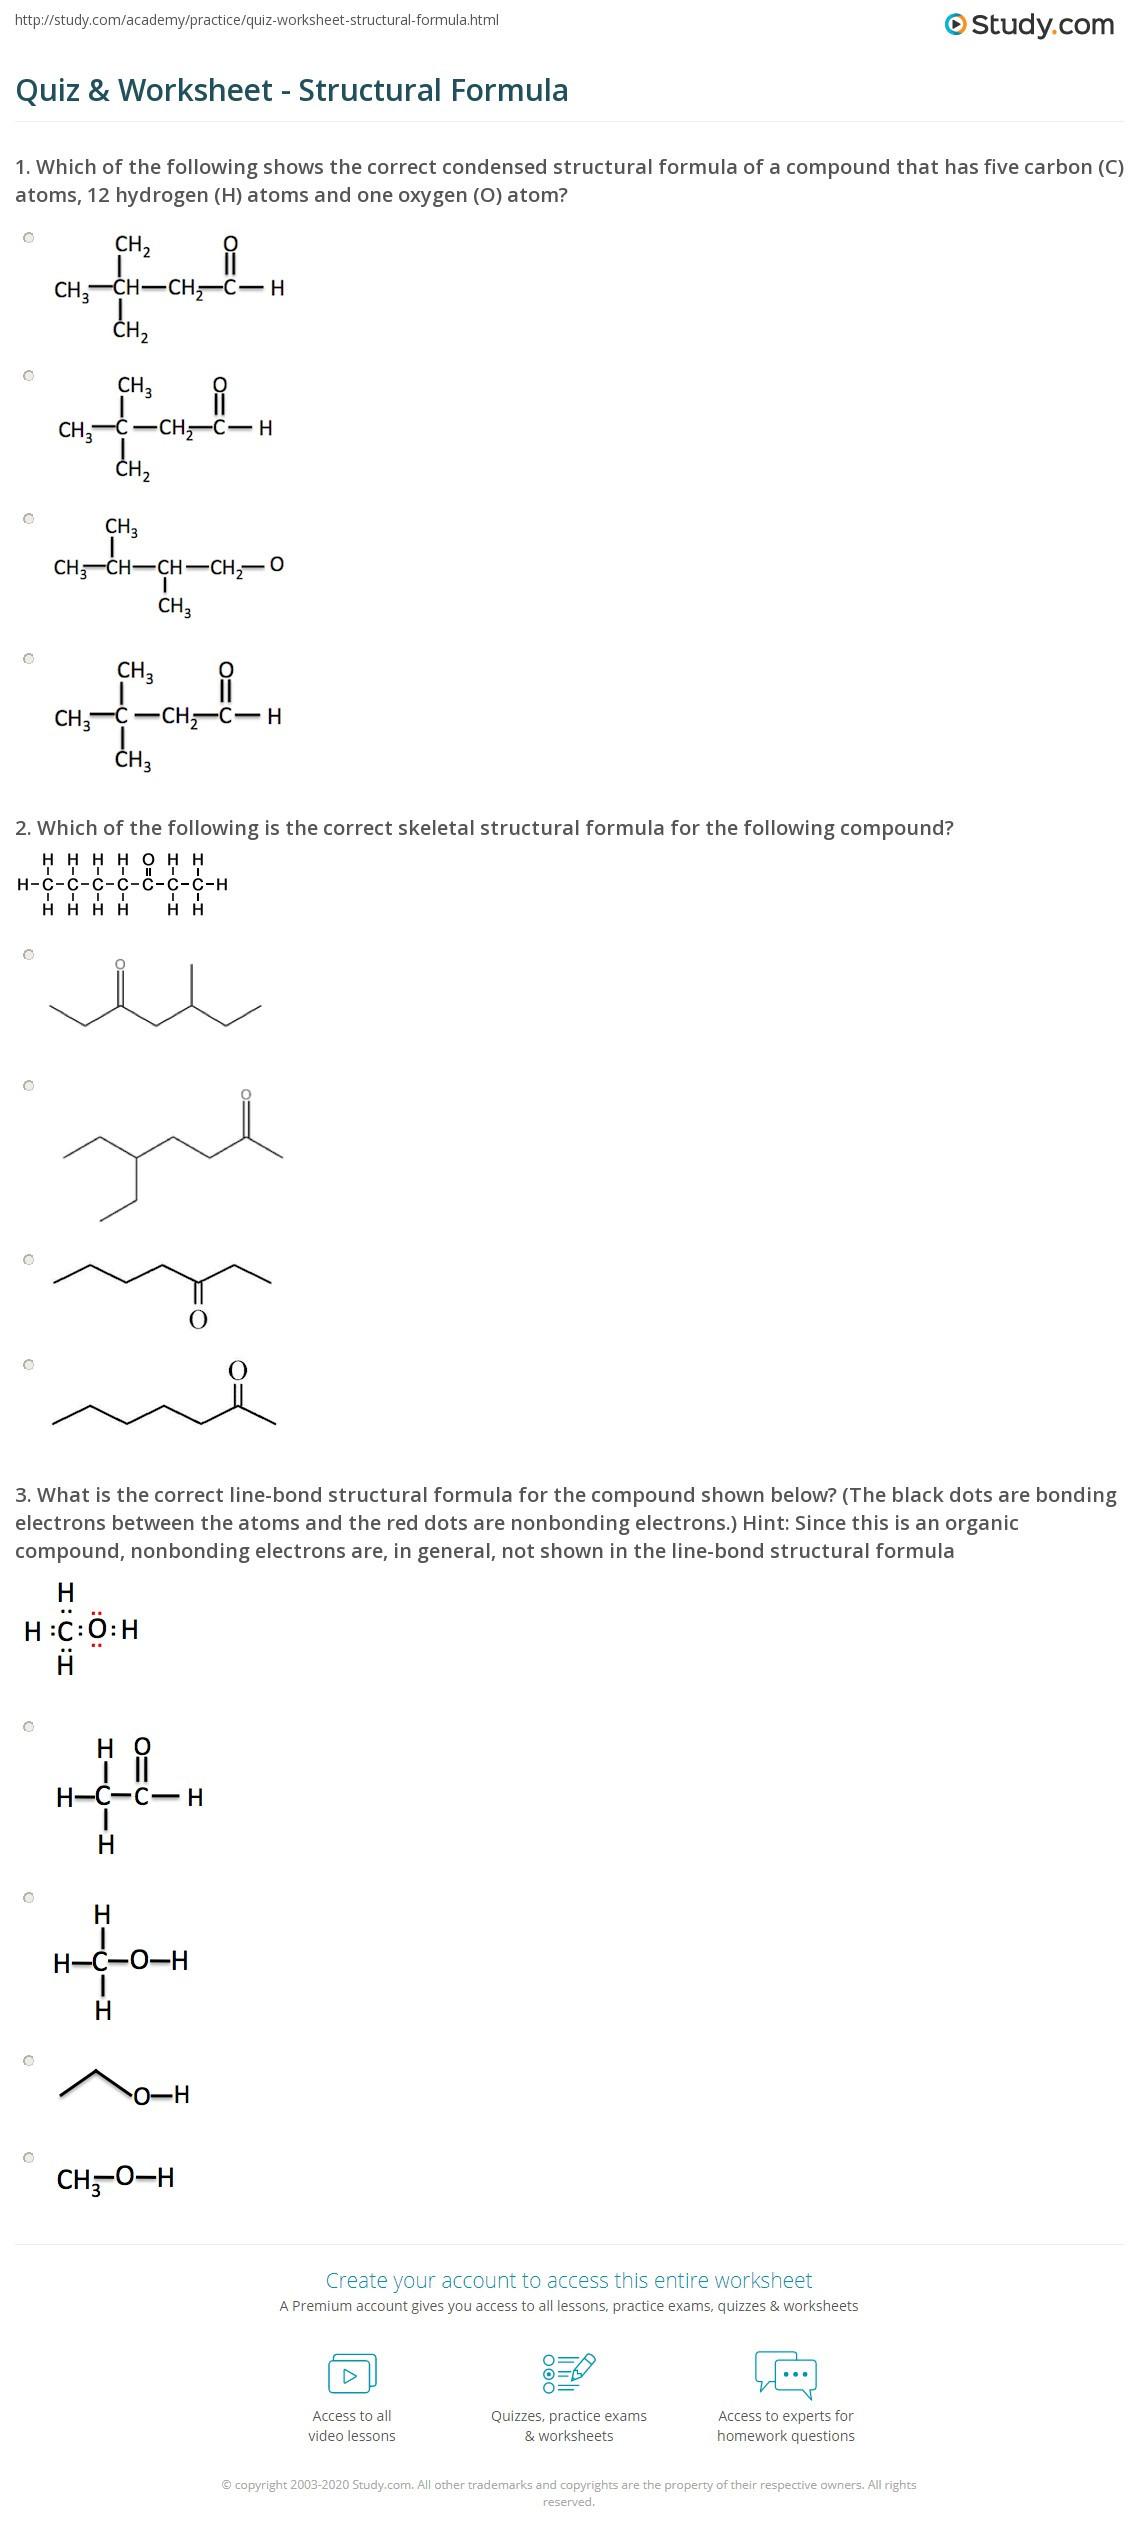 30 Worksheet for Basic Stoichiometry Answer | Education ...